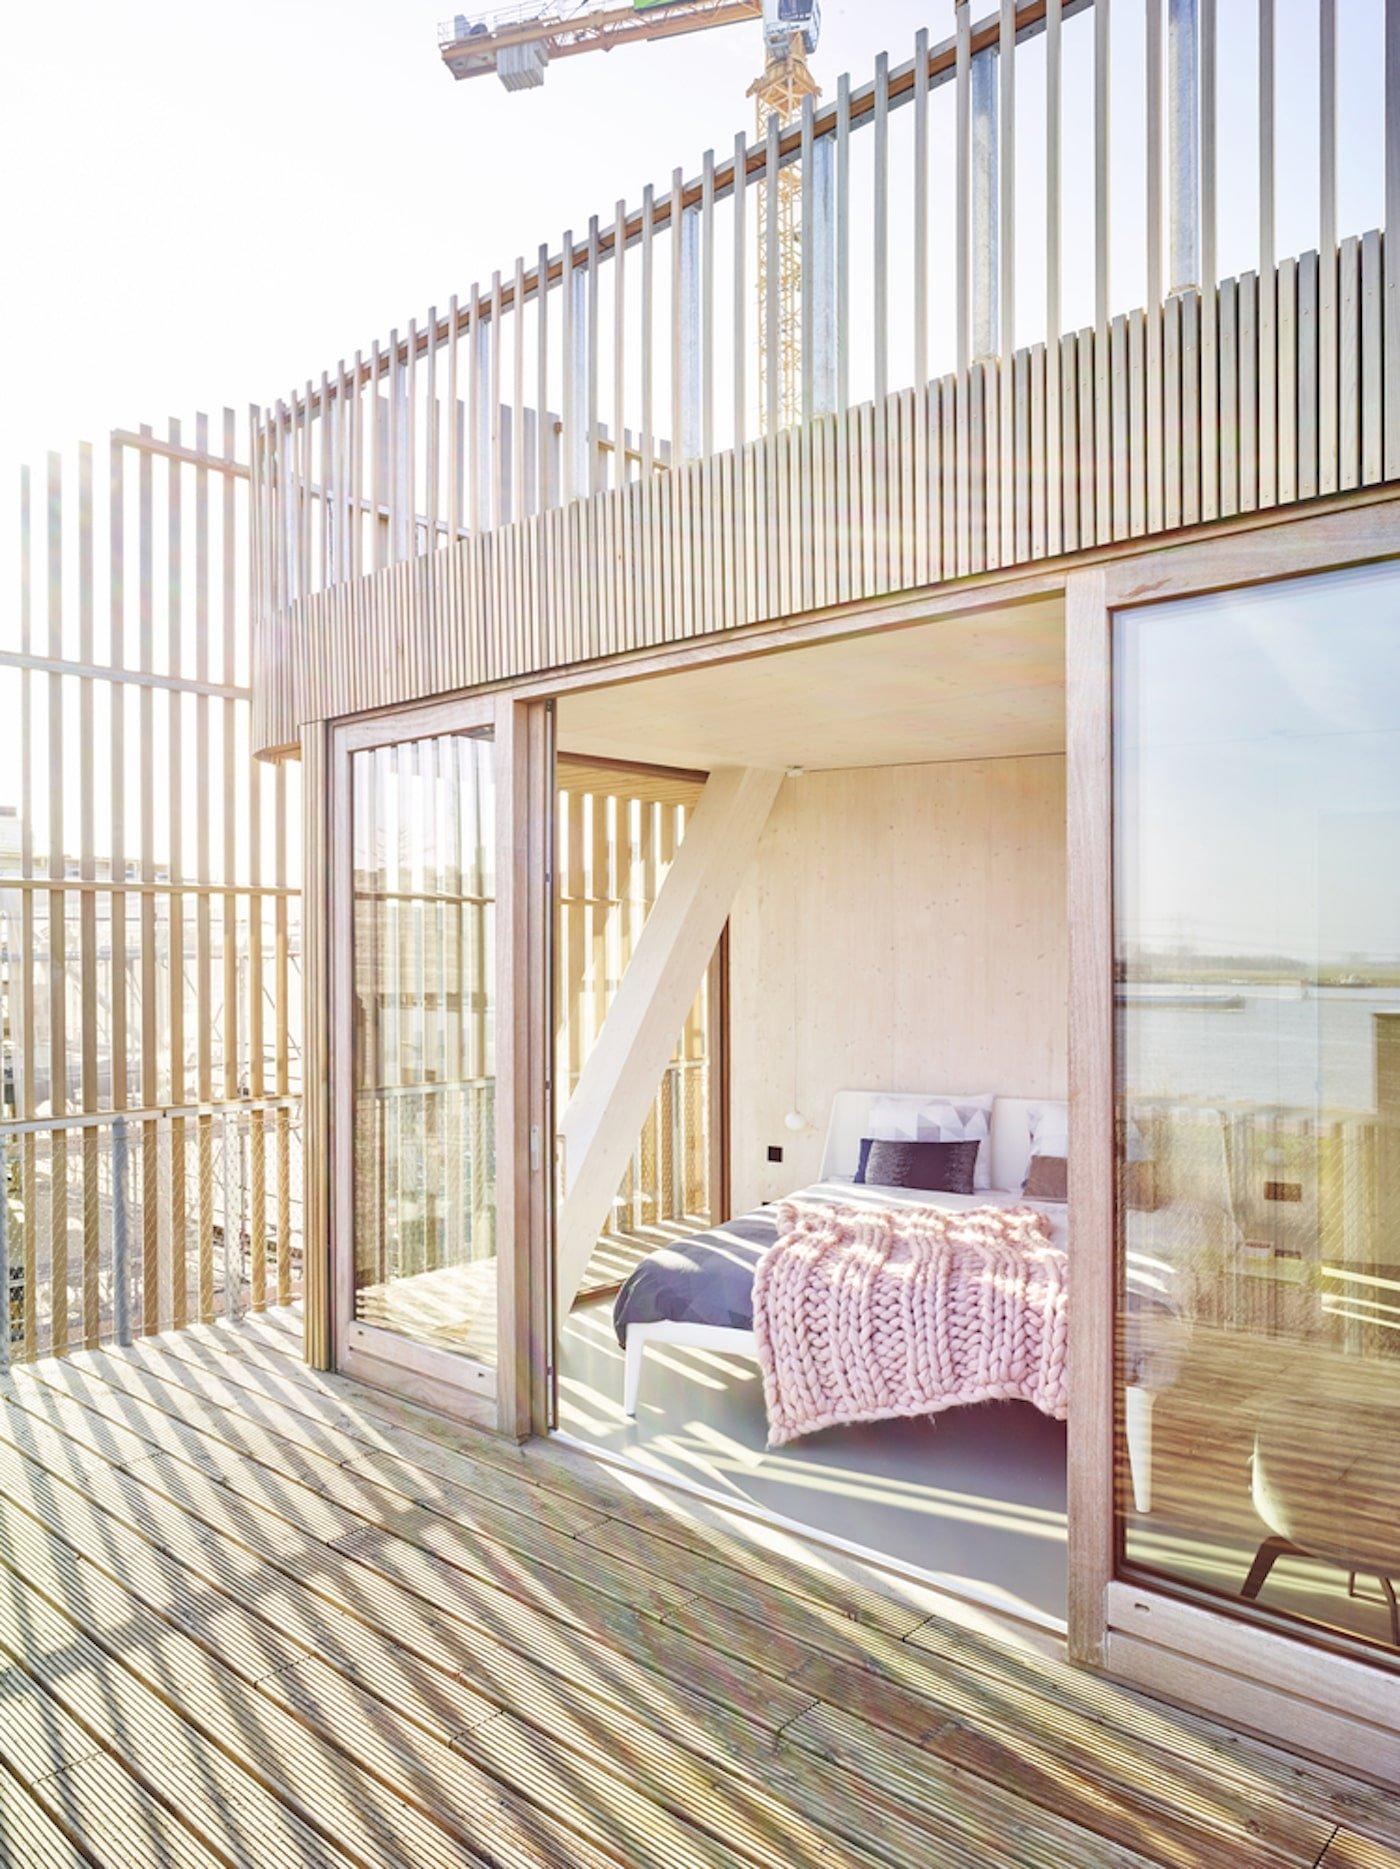 Timber balcony looking into bedroom